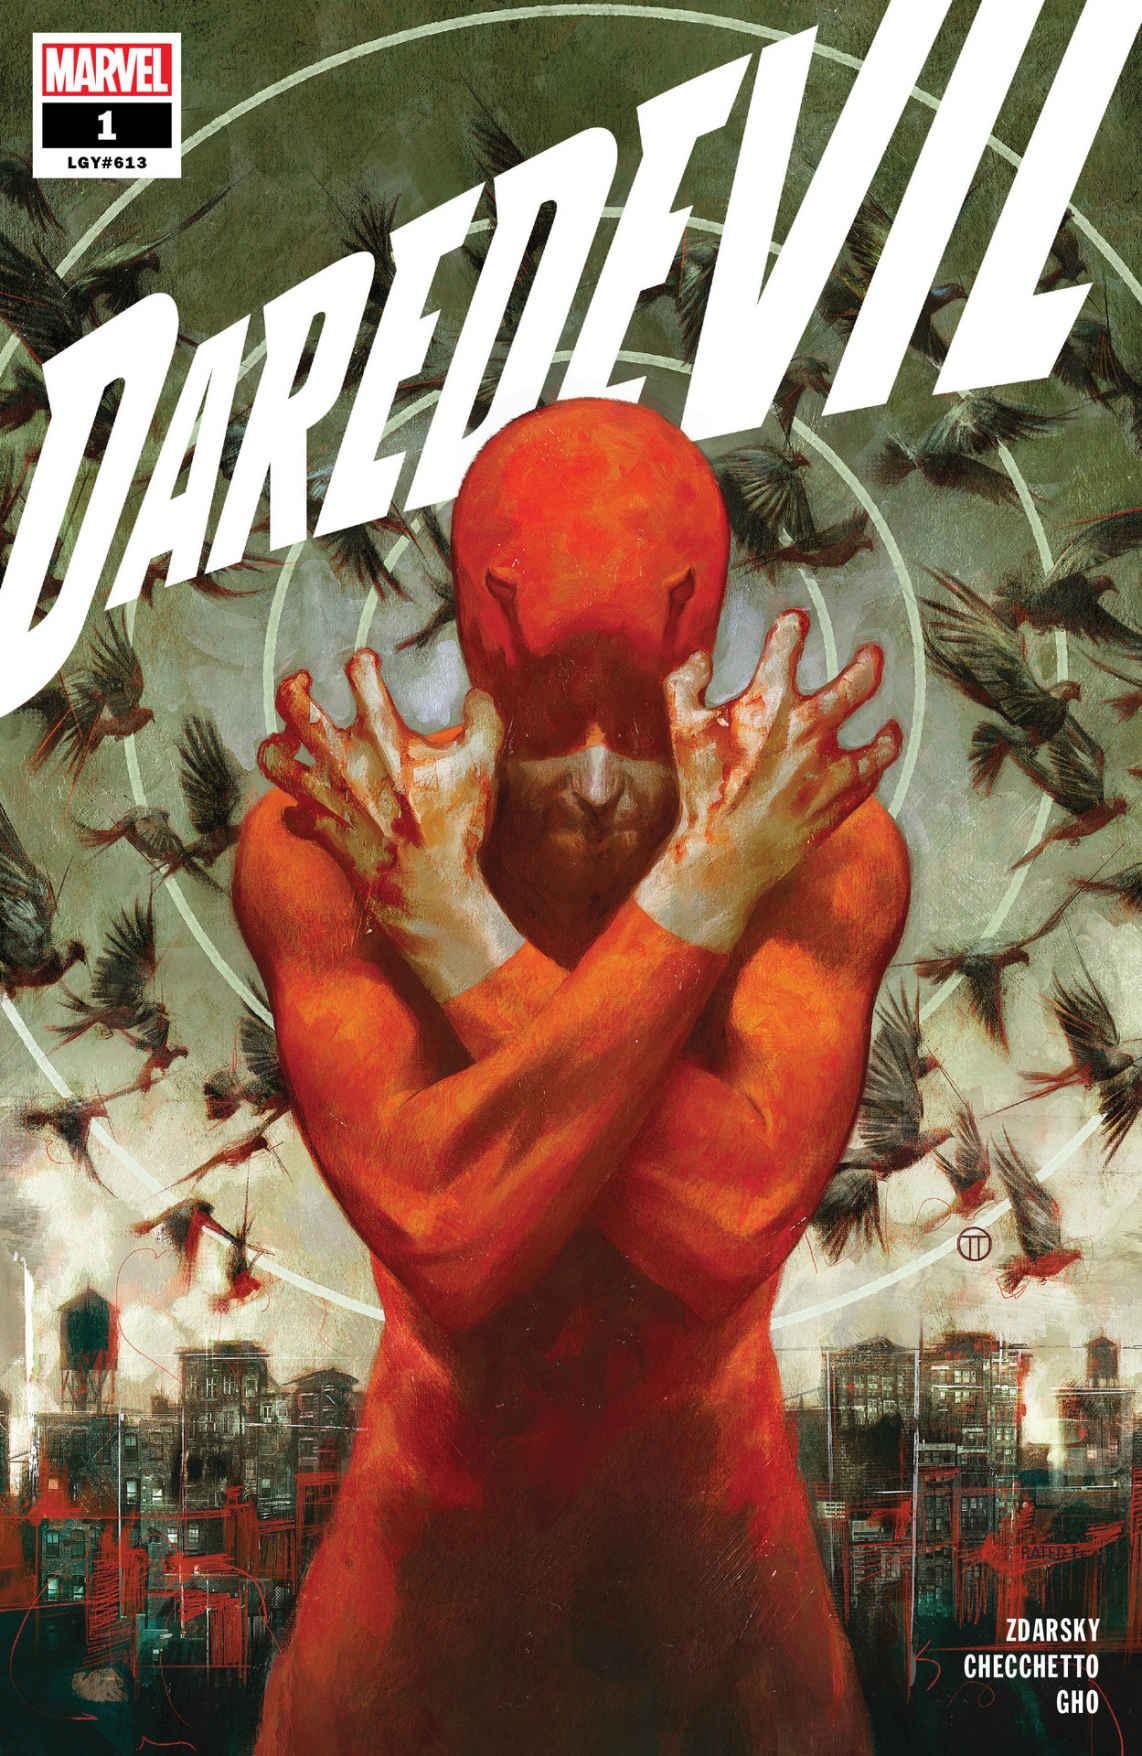 Best Comics of 2019: Daredevil